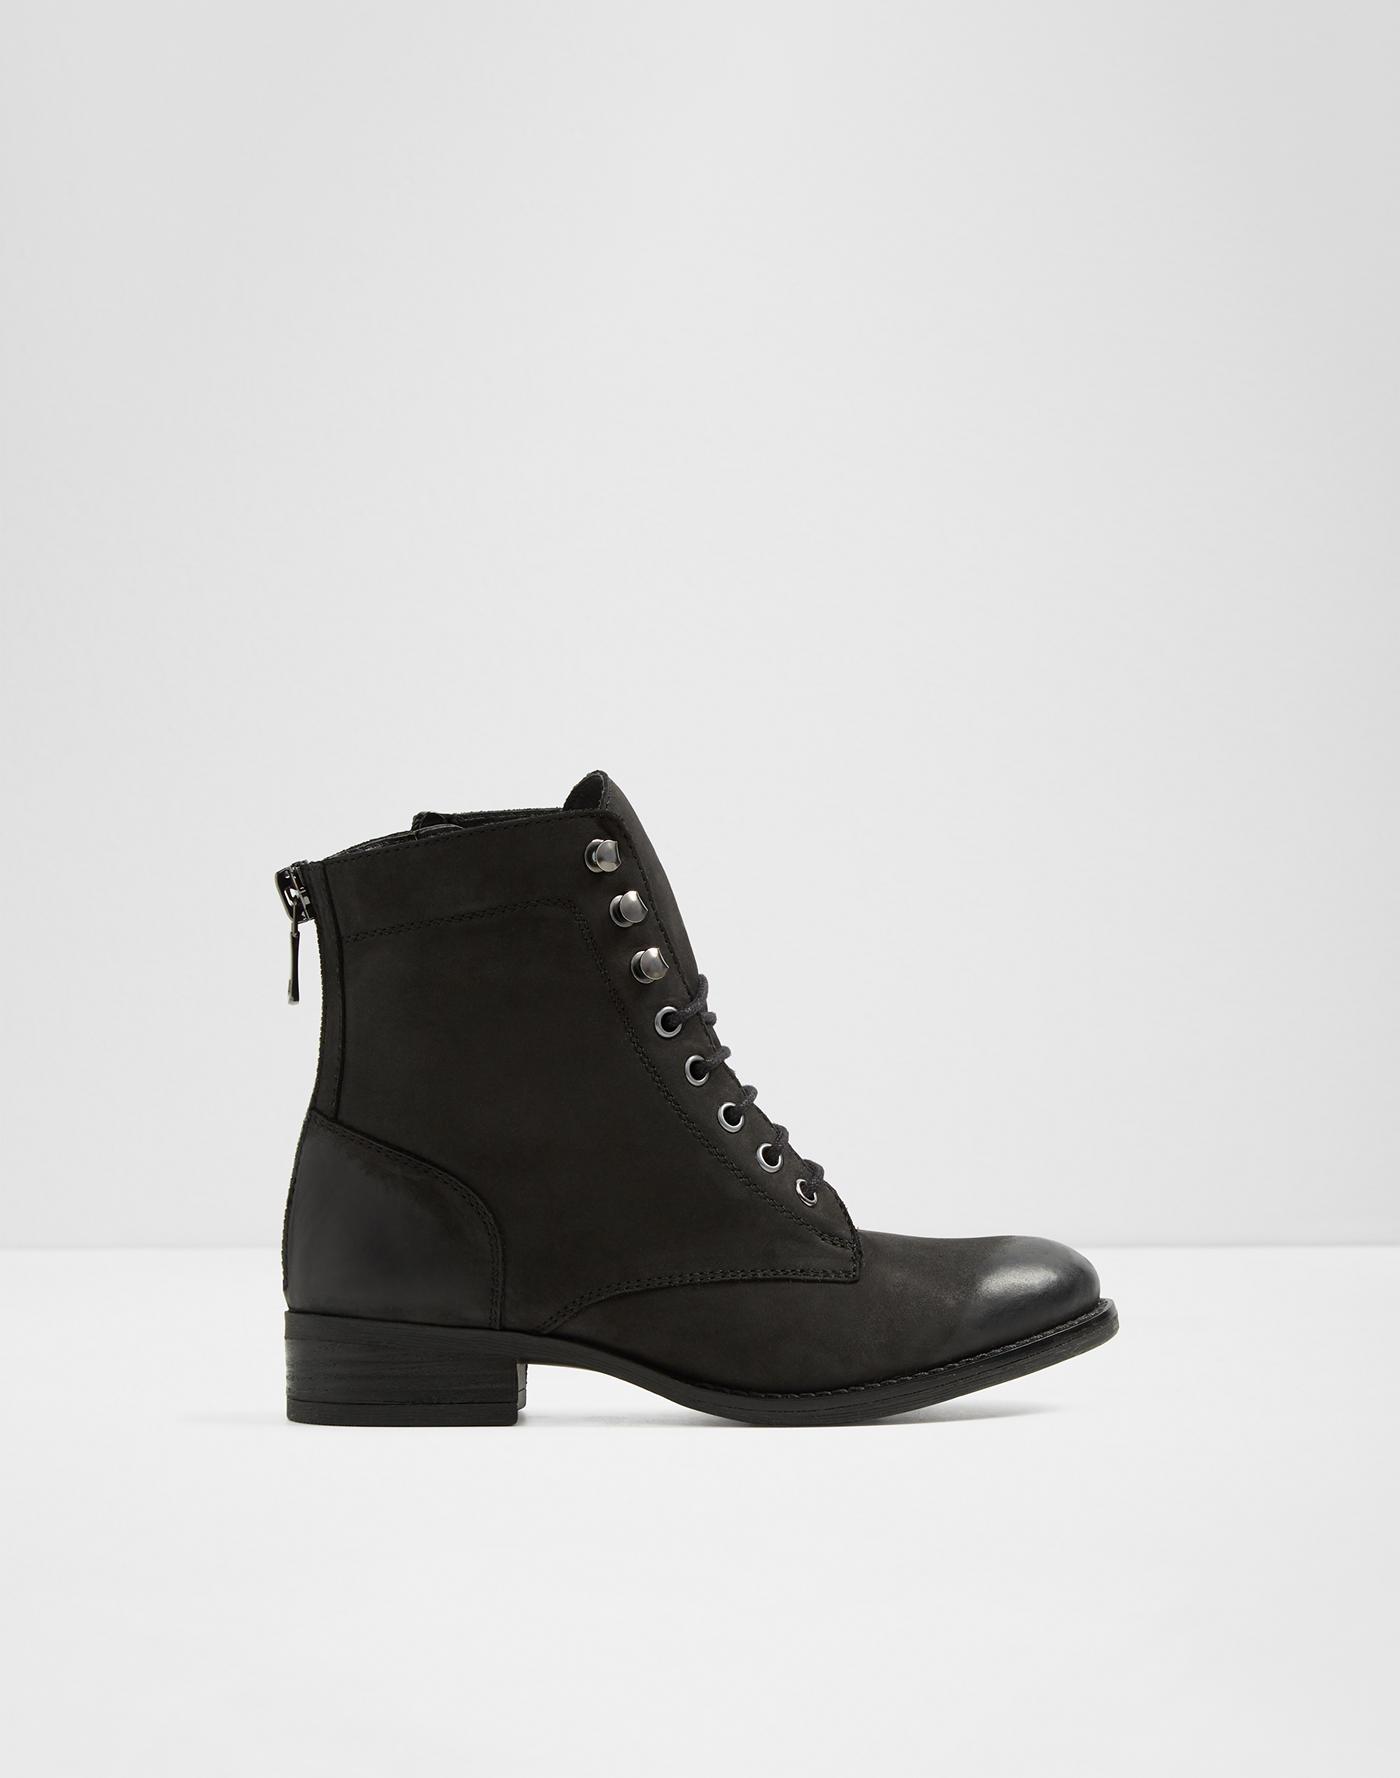 bb256efae Women's Sales | Shoe Sale | ALDO Canada | ALDO Canada